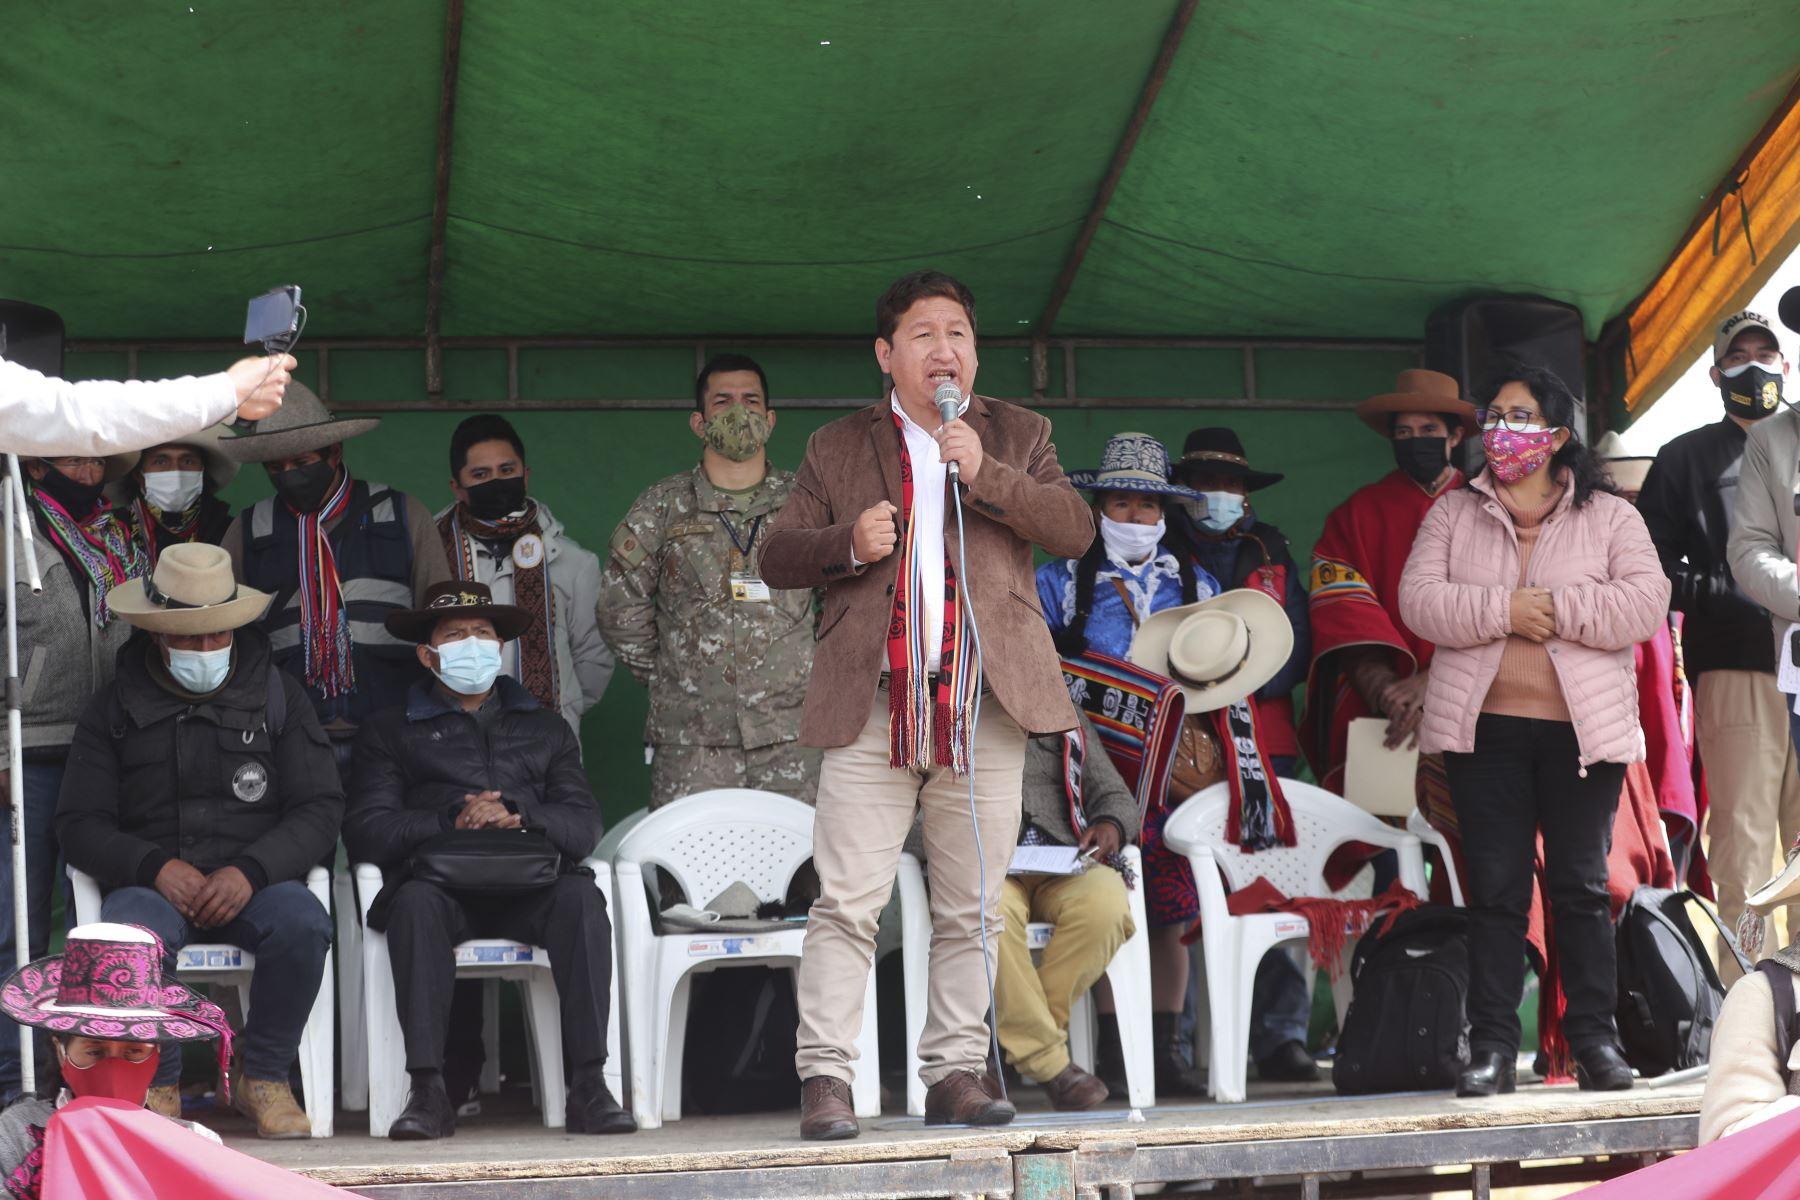 Jefe del Gabinete espera desbloqueo del corredor minero tras diálogo con comunidades